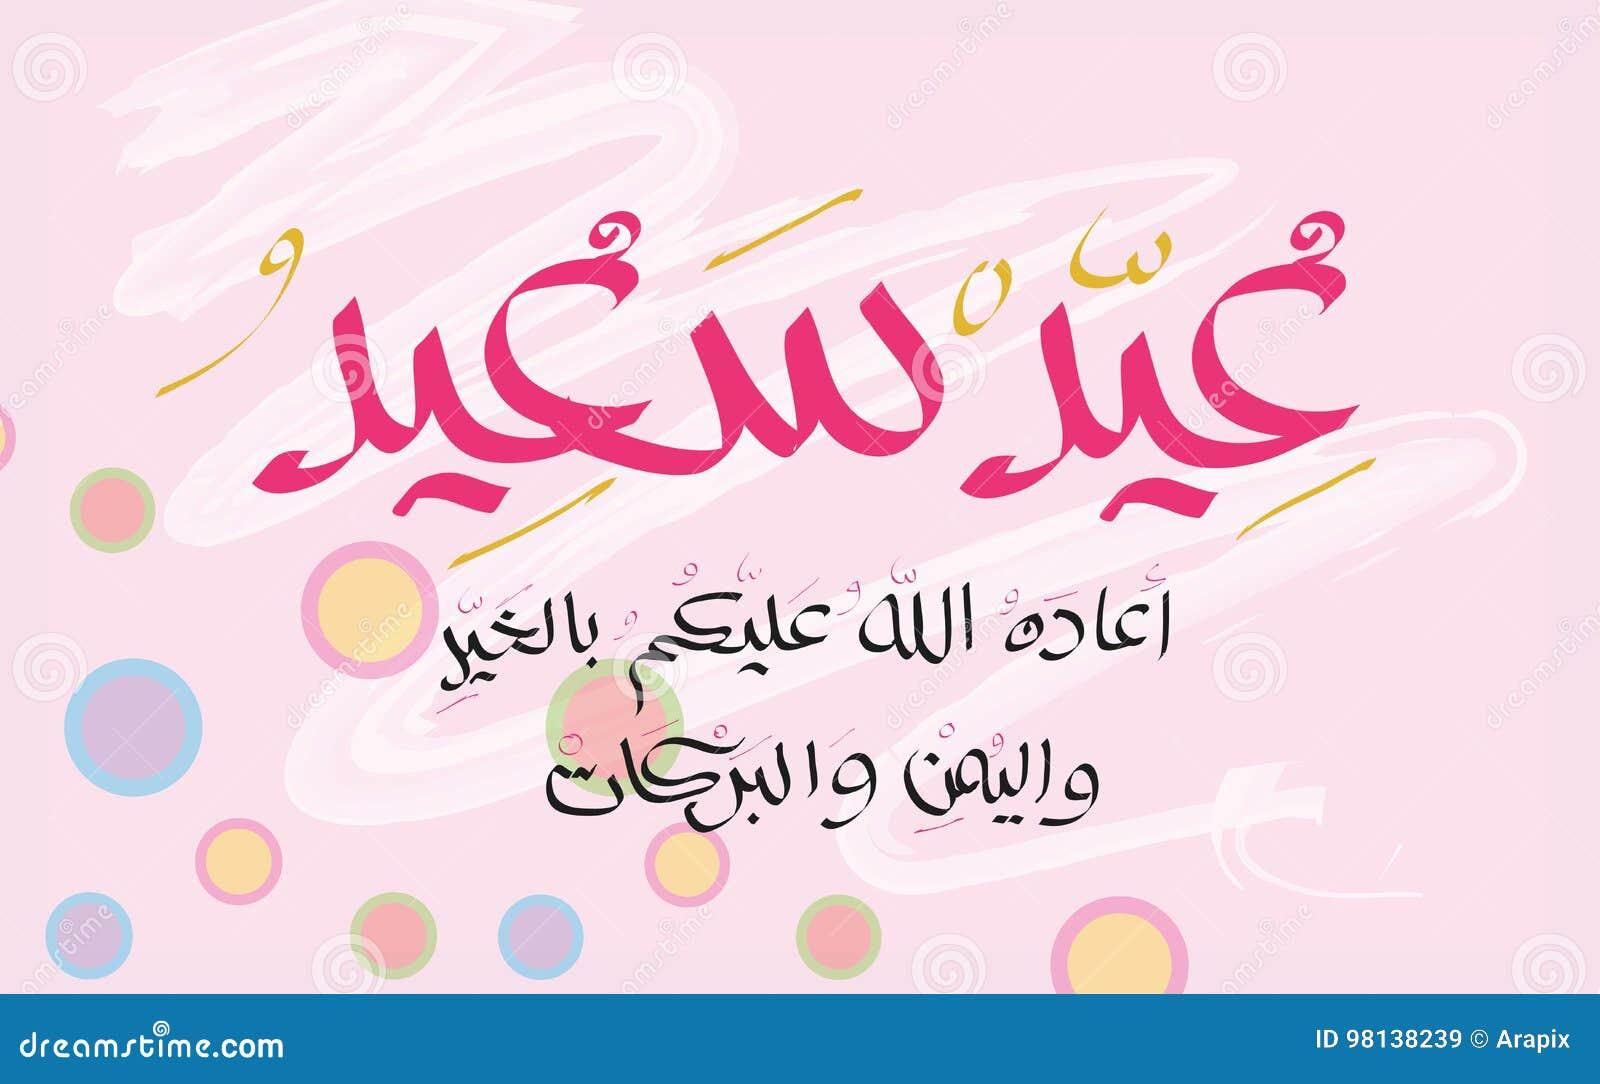 Eid saeed greeting card translation happy feast arabi stock download eid saeed greeting card translation happy feast arabi stock m4hsunfo